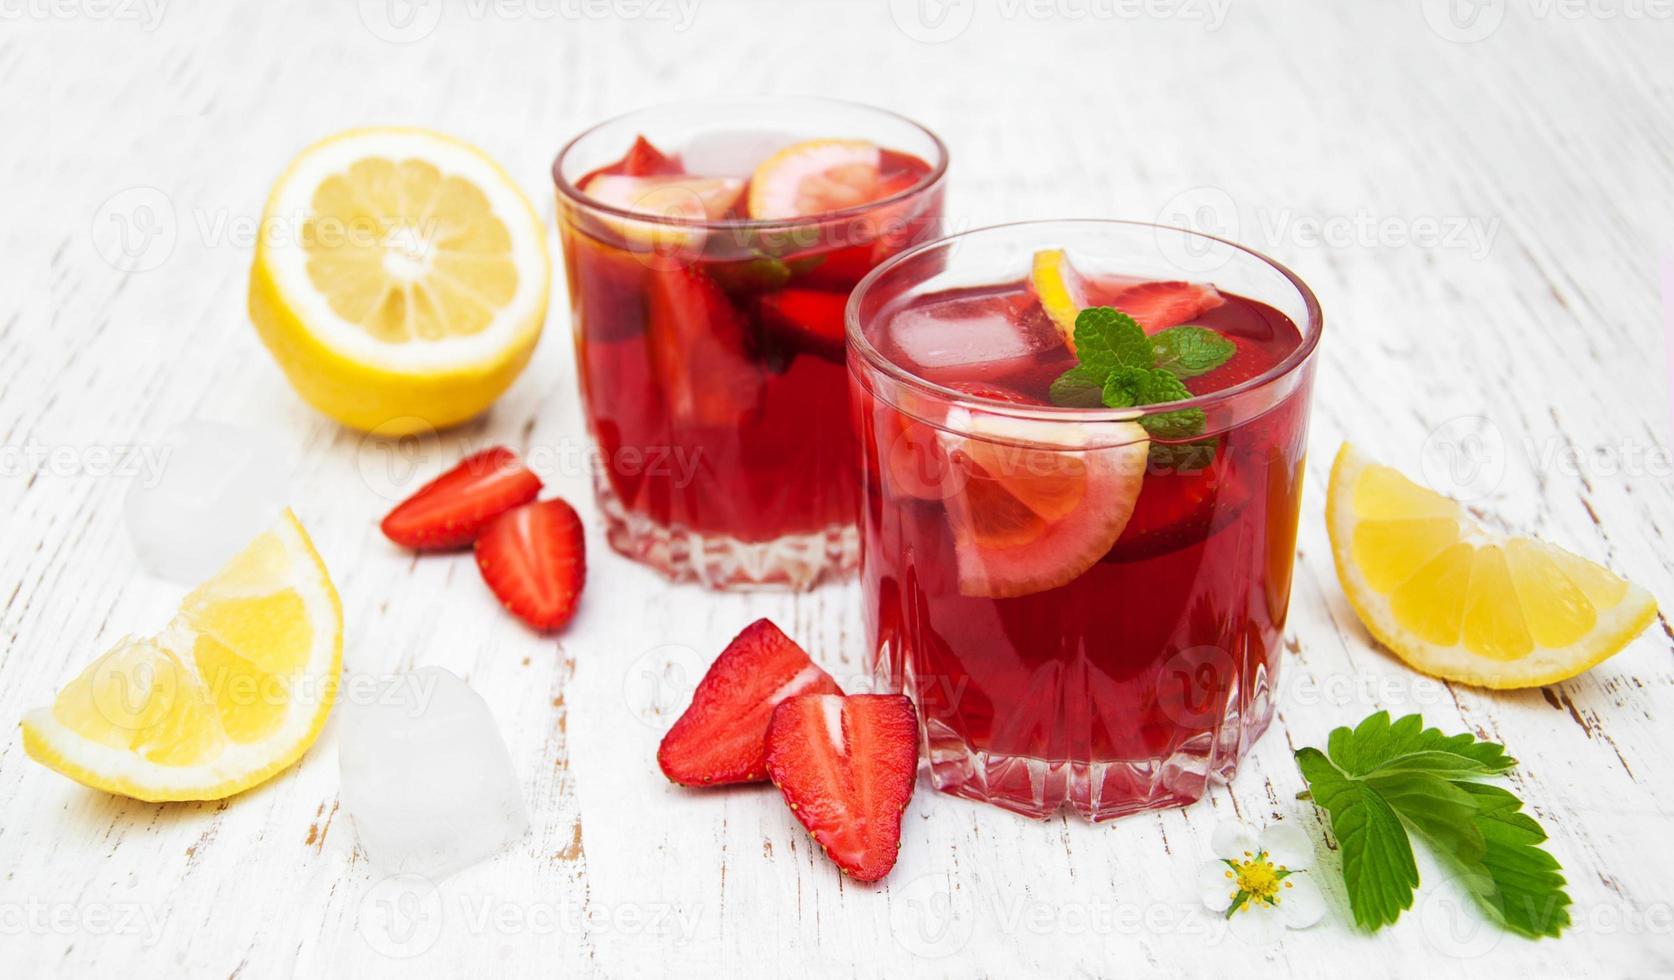 Summer strawberry drink photo